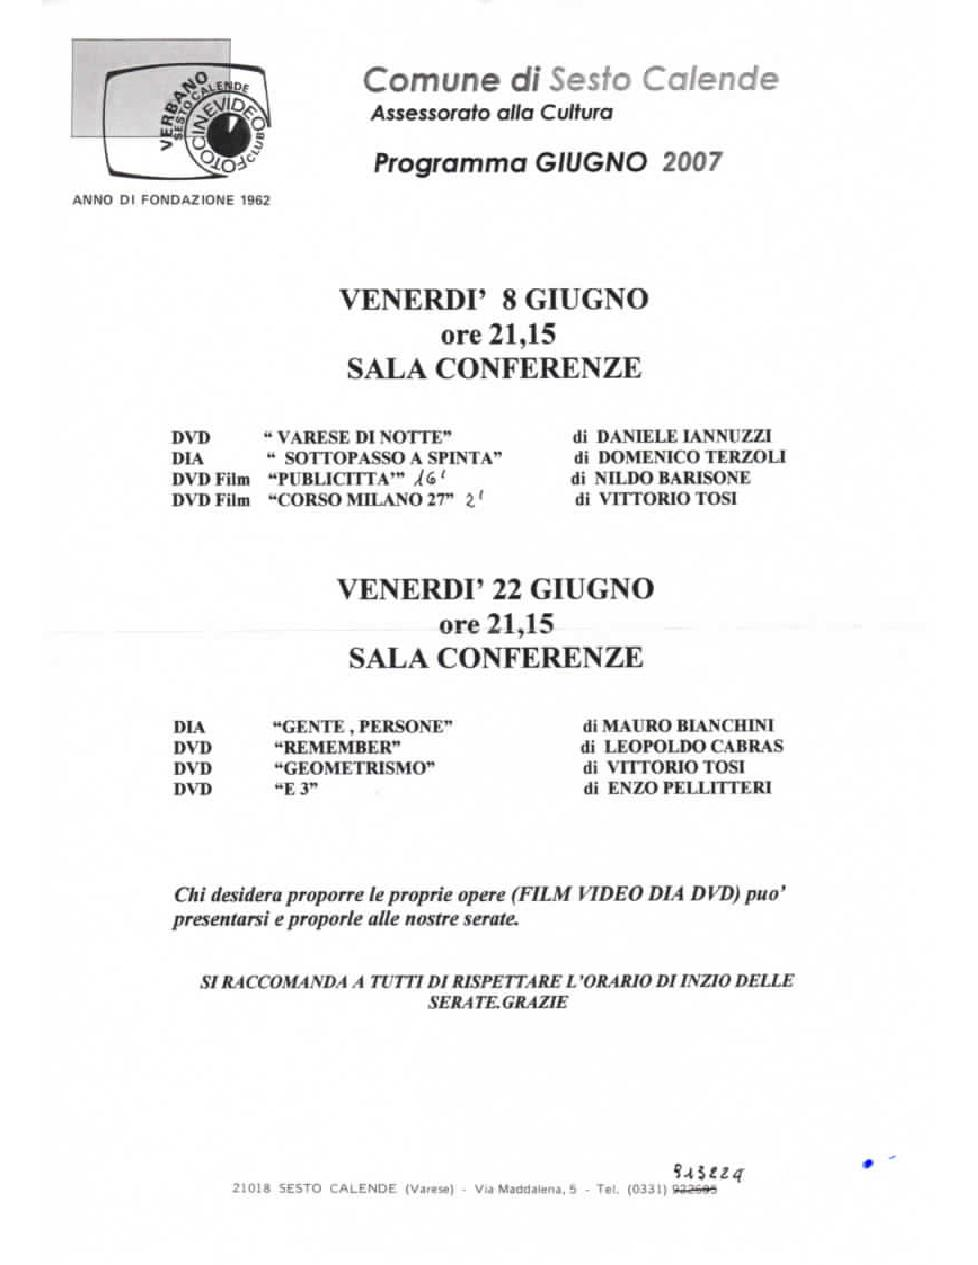 img052-1